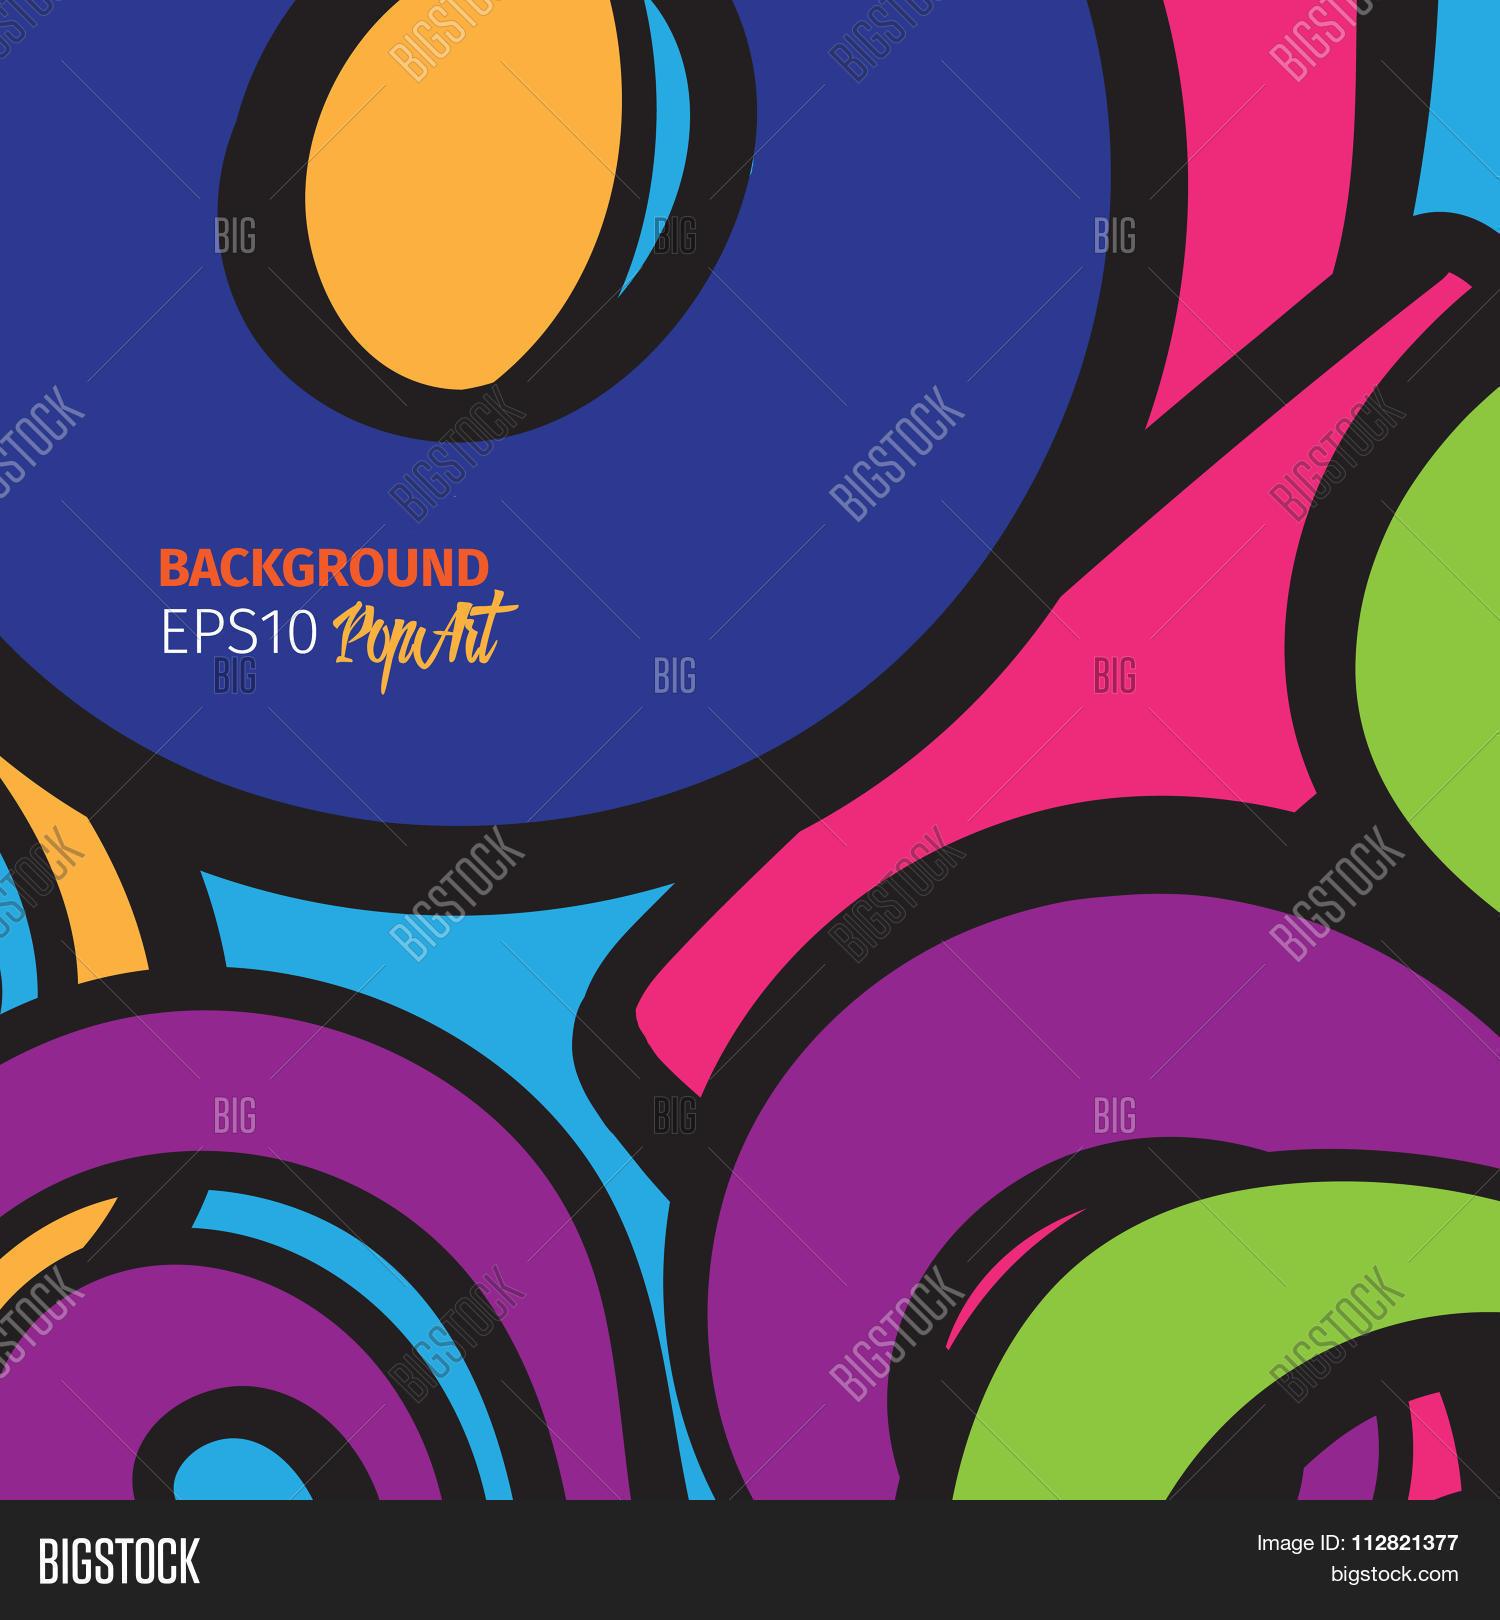 images?q=tbn:ANd9GcQh_l3eQ5xwiPy07kGEXjmjgmBKBRB7H2mRxCGhv1tFWg5c_mWT Ideas For Pop Art Color Schemes @koolgadgetz.com.info